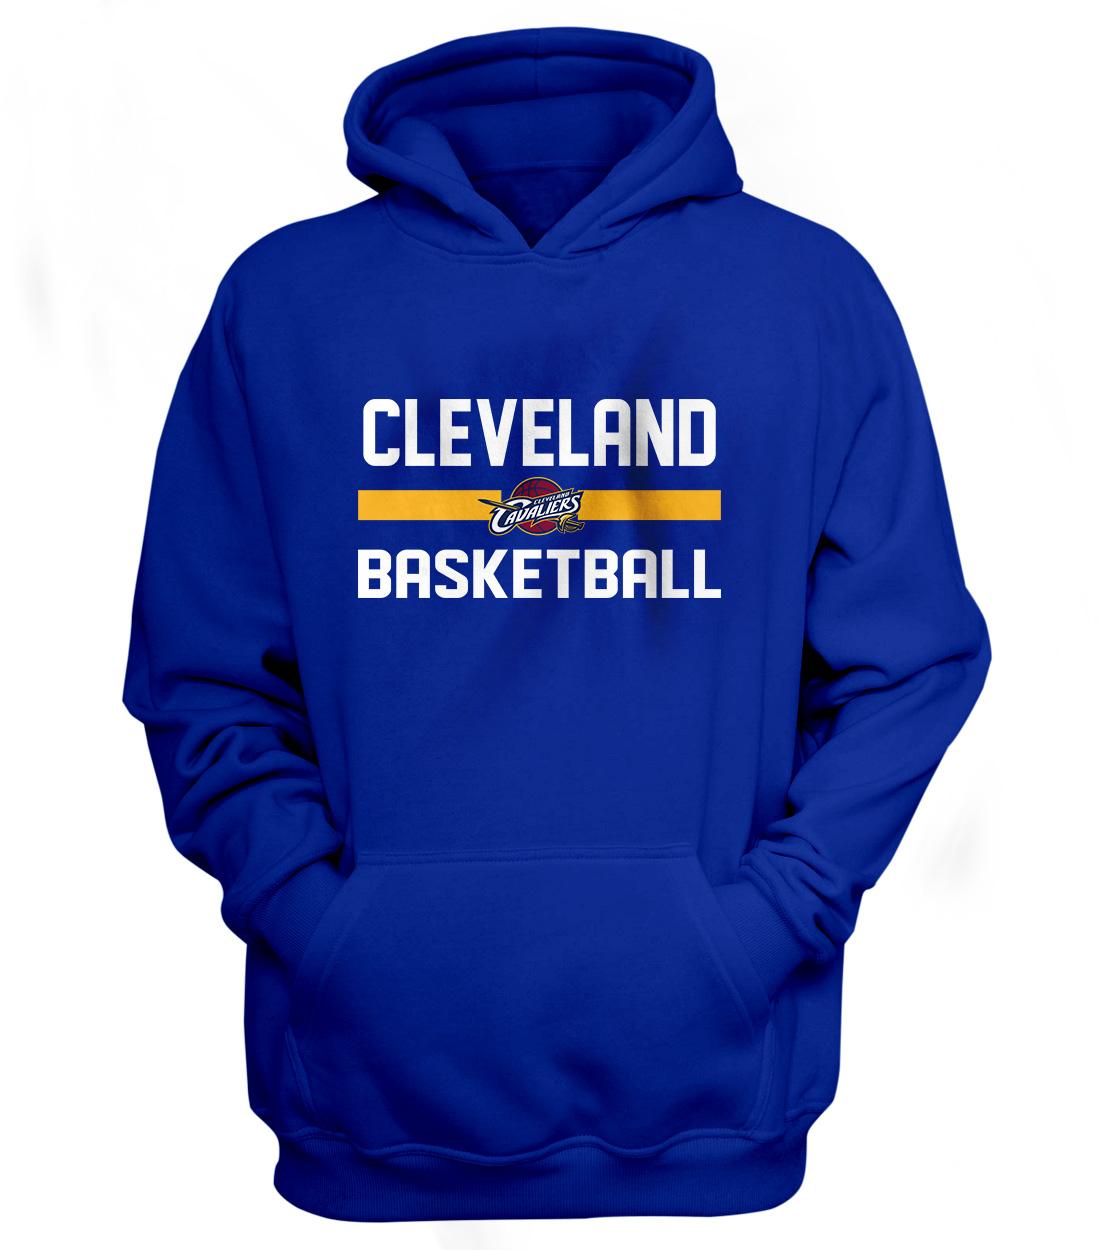 Cleveland Basketball Hoodie (HD-BLU-NP-66-NBA-CLE-BASKETBALL)